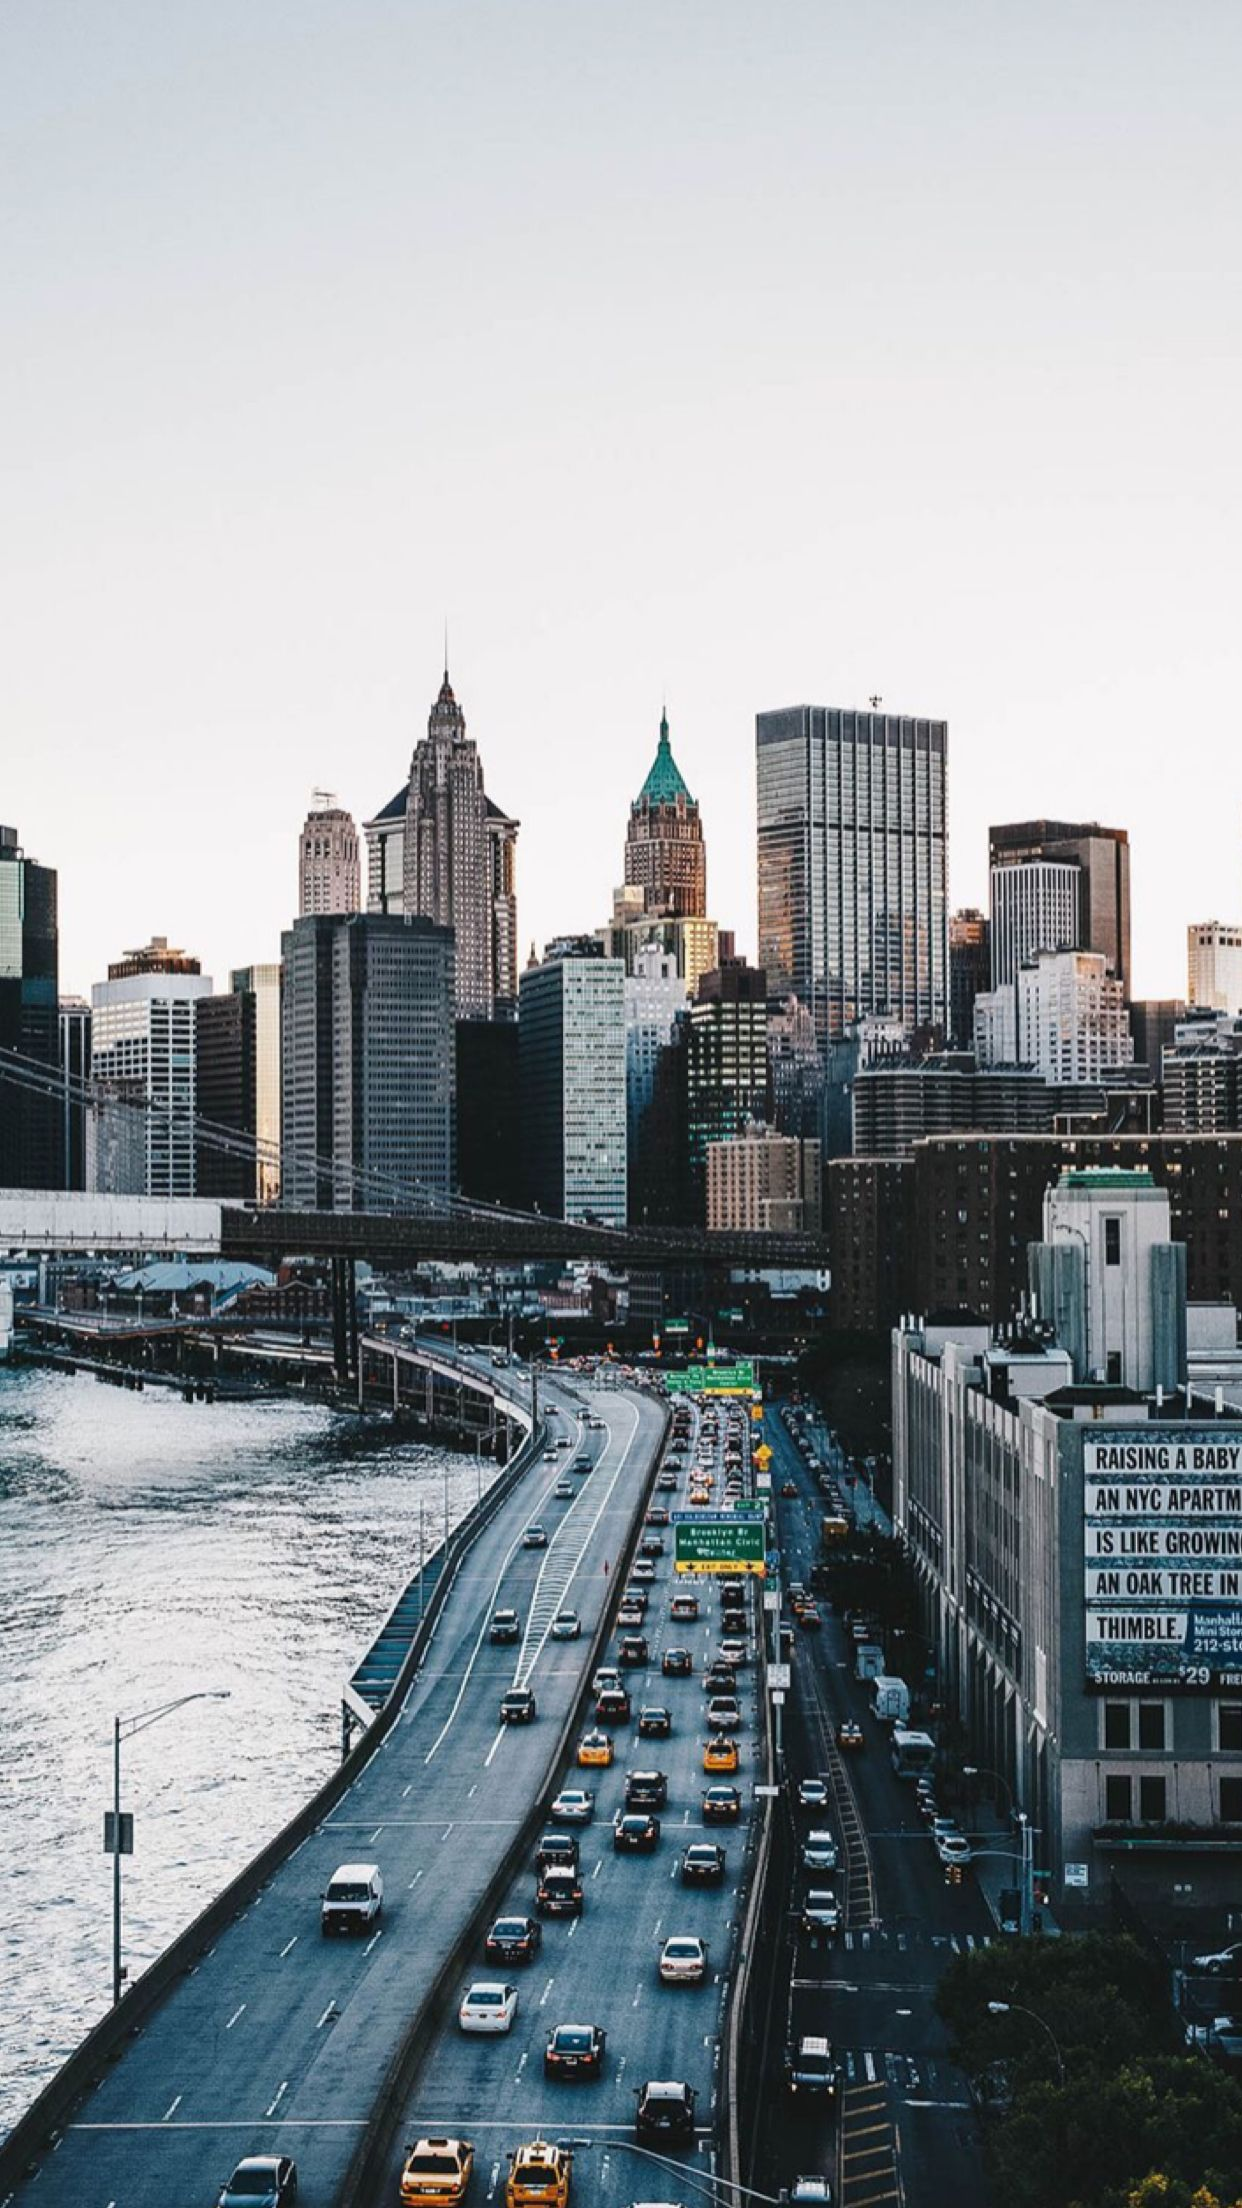 Pin By Daria Aleksandrova On Travel New York Photography New York City Aesthetic